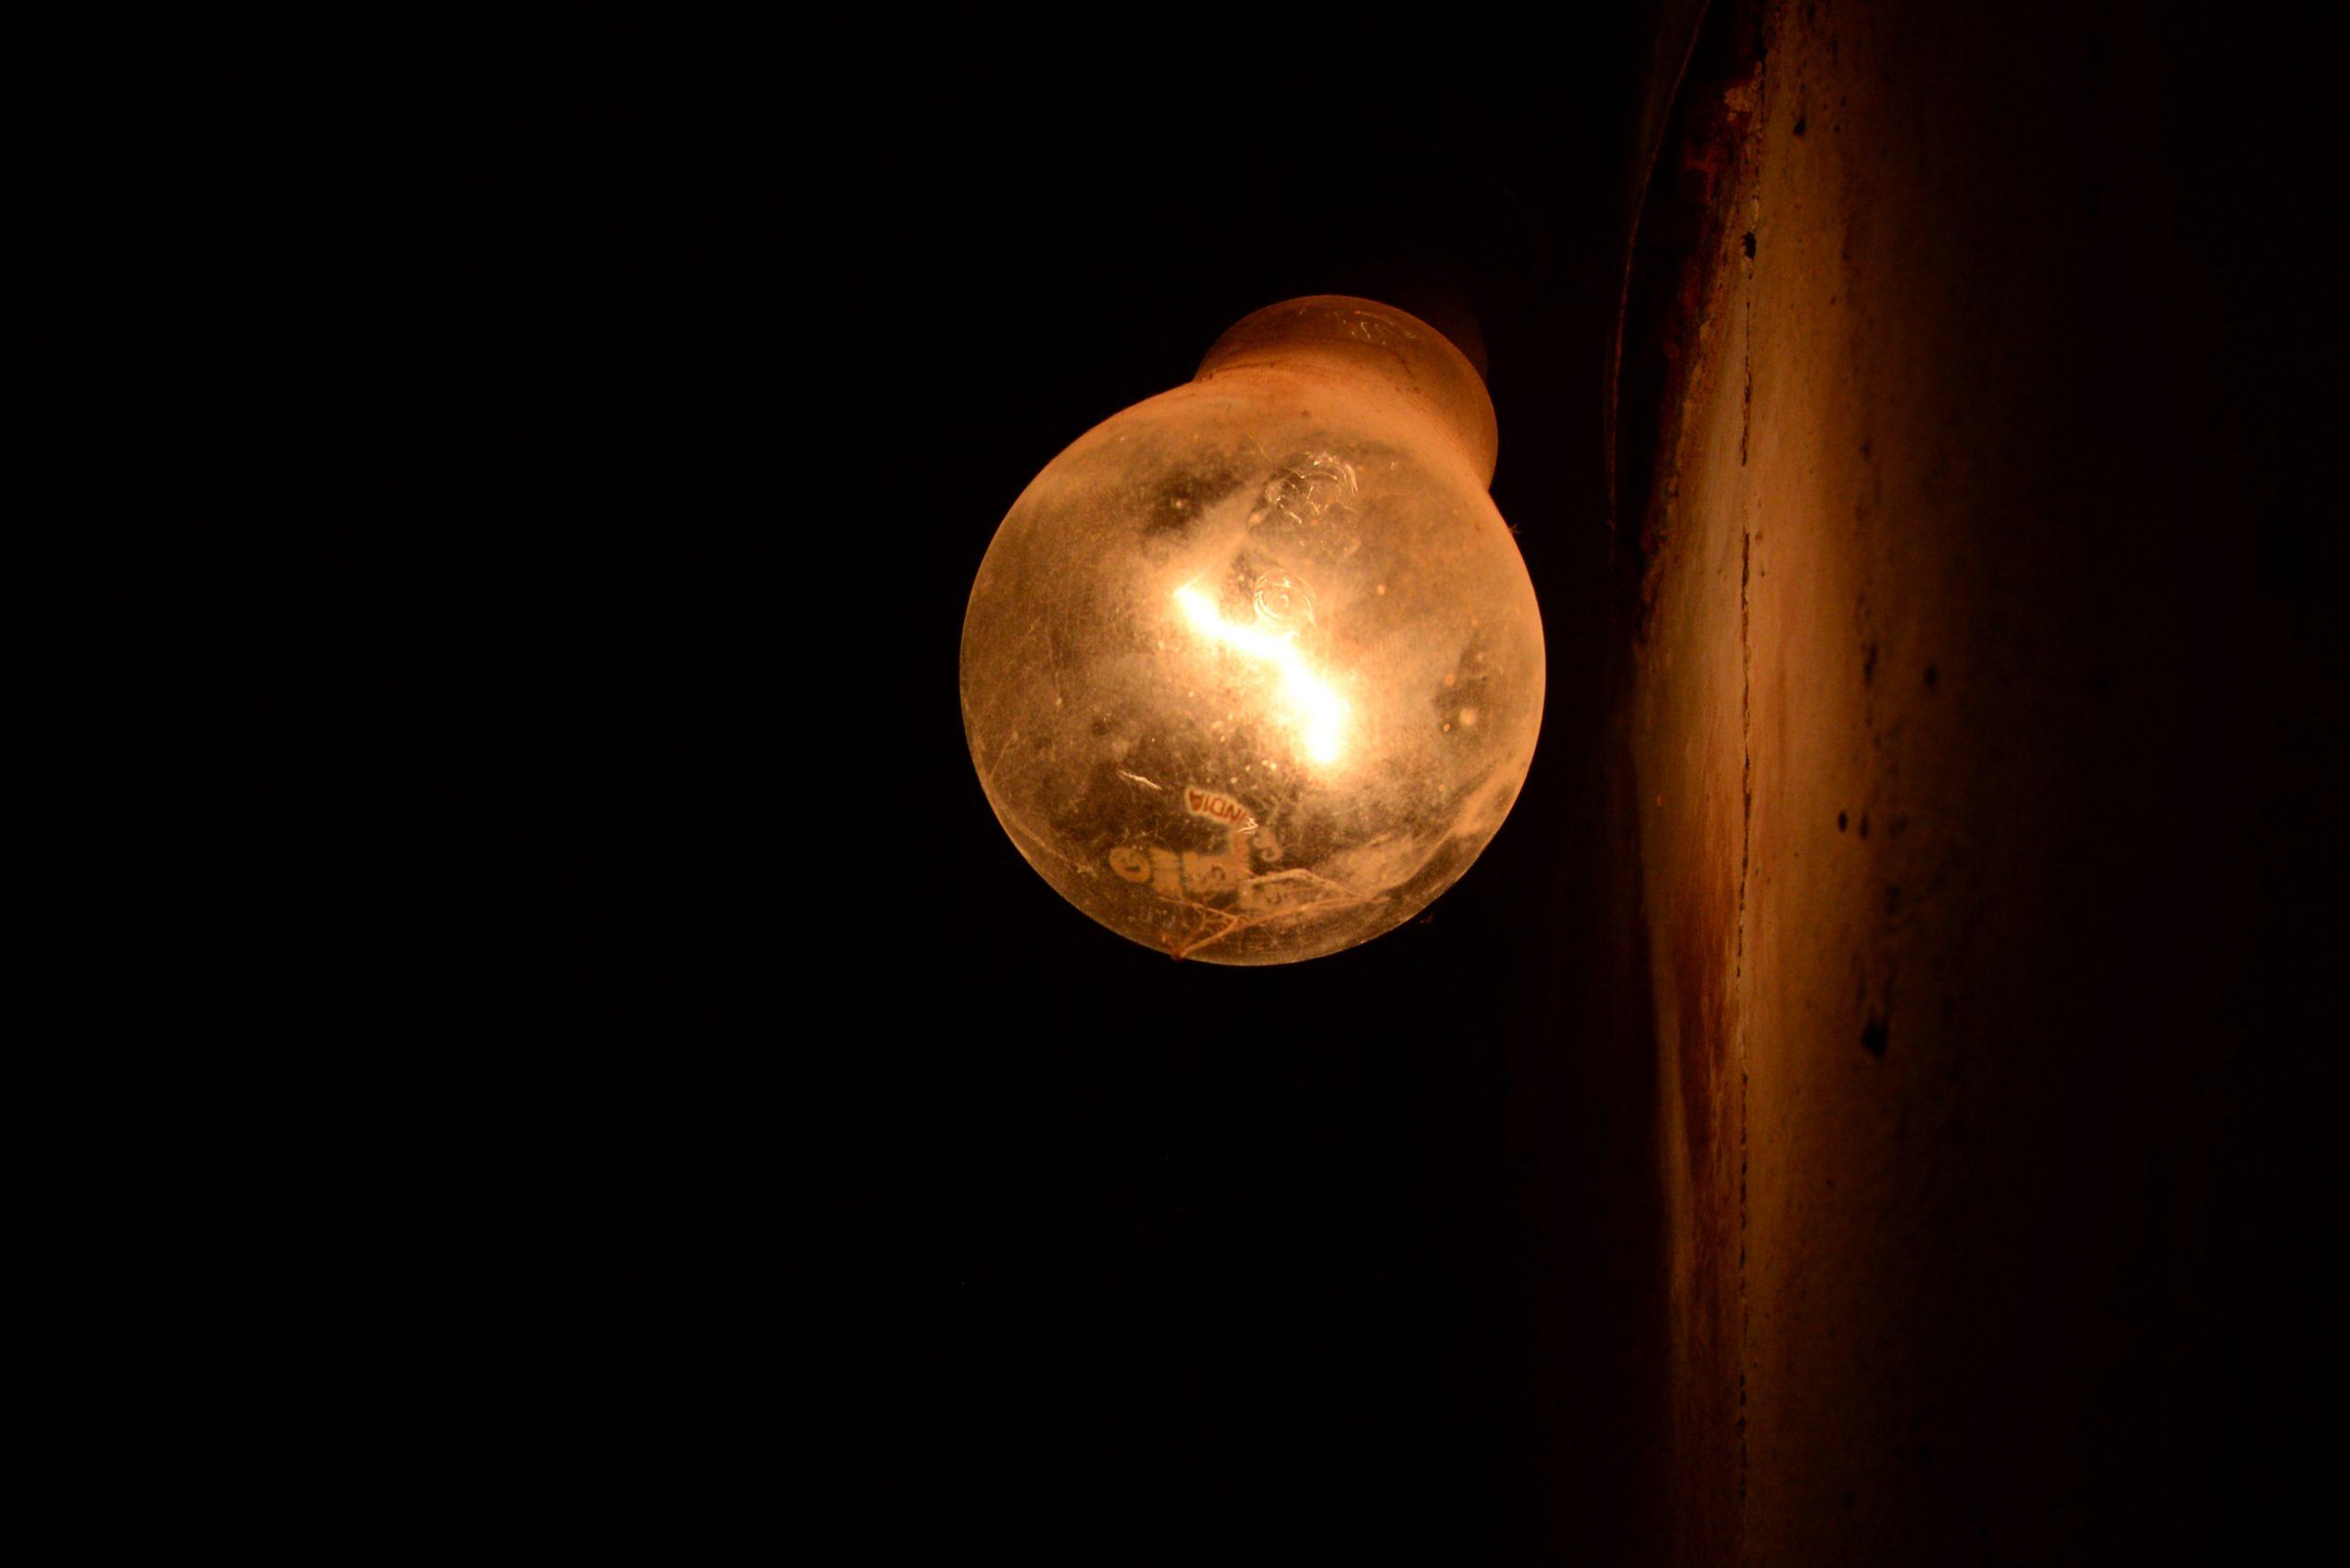 Tungsten Bulb on Focus